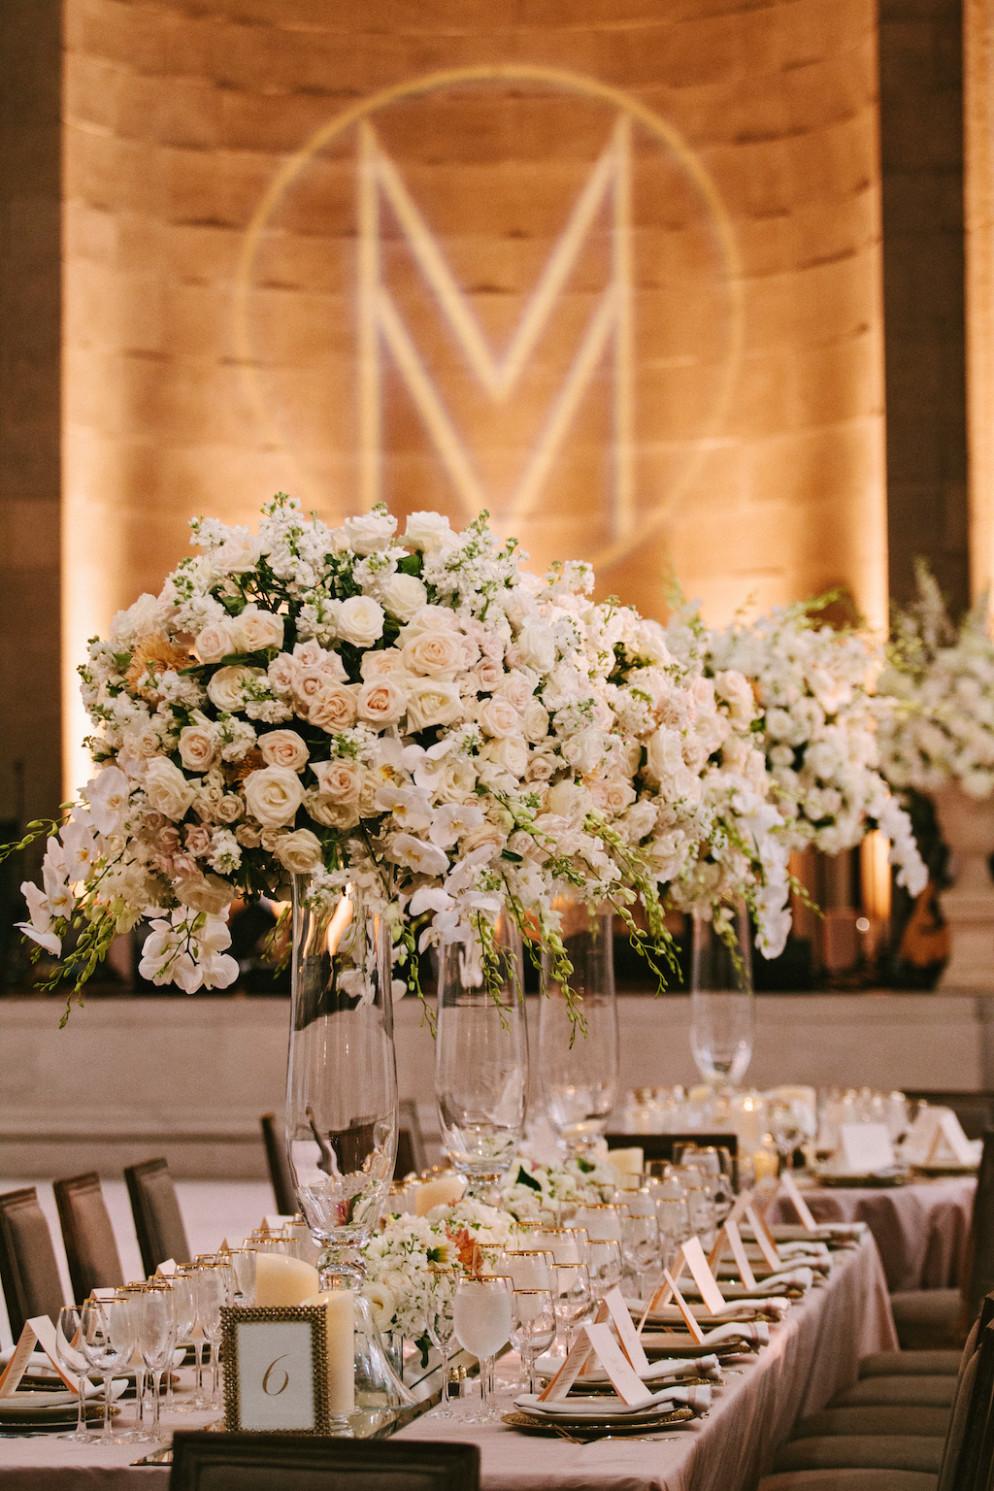 5-6-16-amazing-dc-wedding-flowers-12